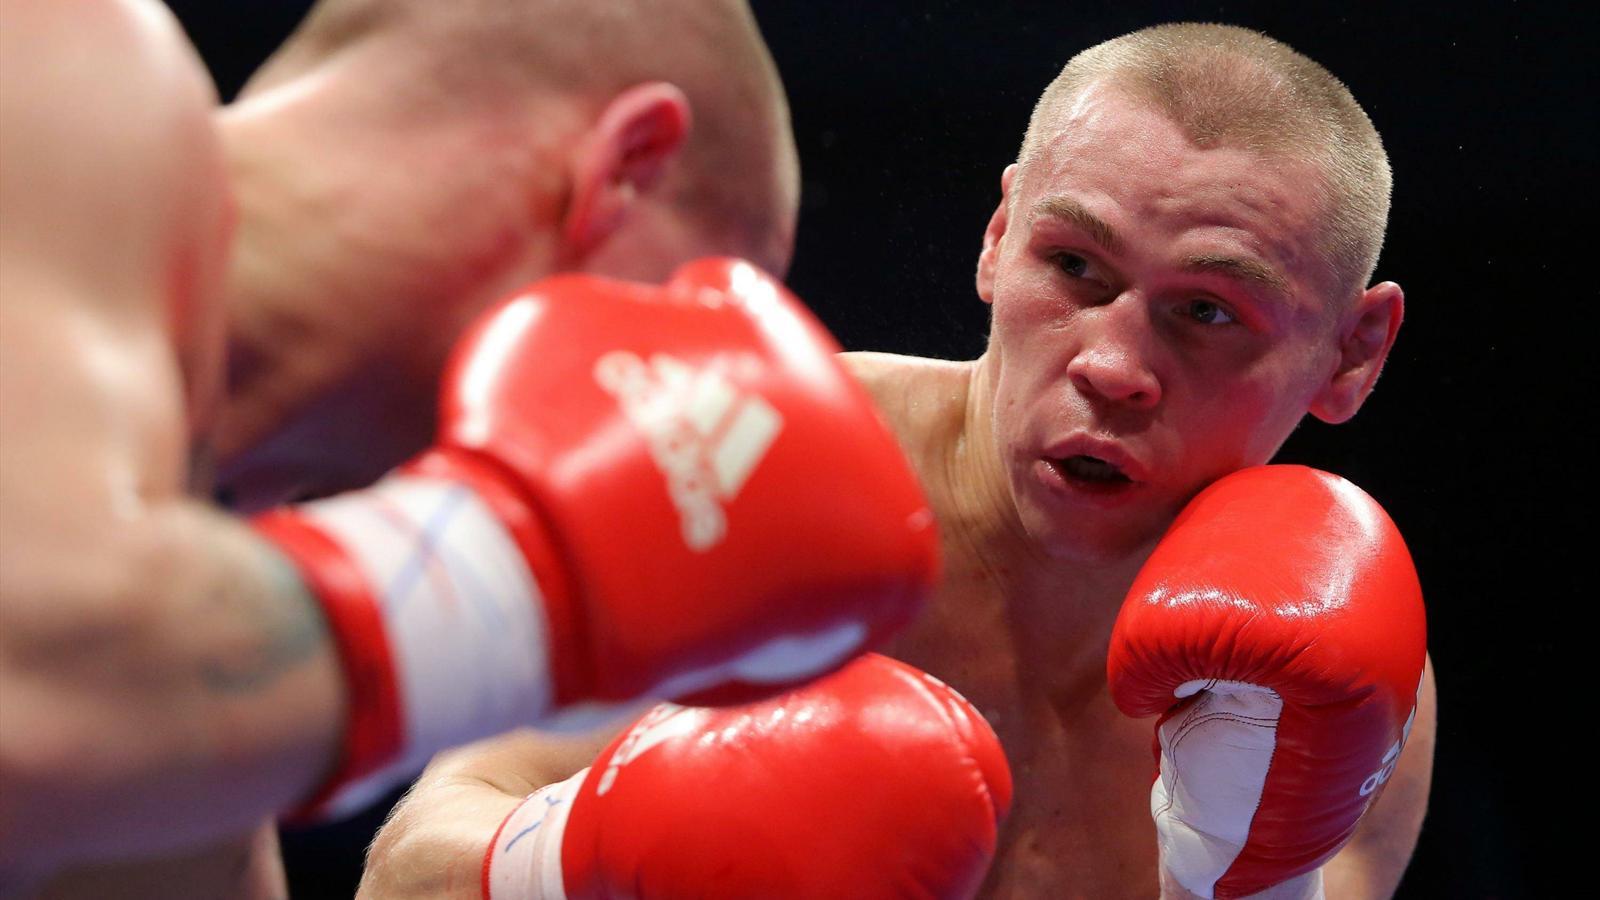 Владимир никитин боксер рио фото